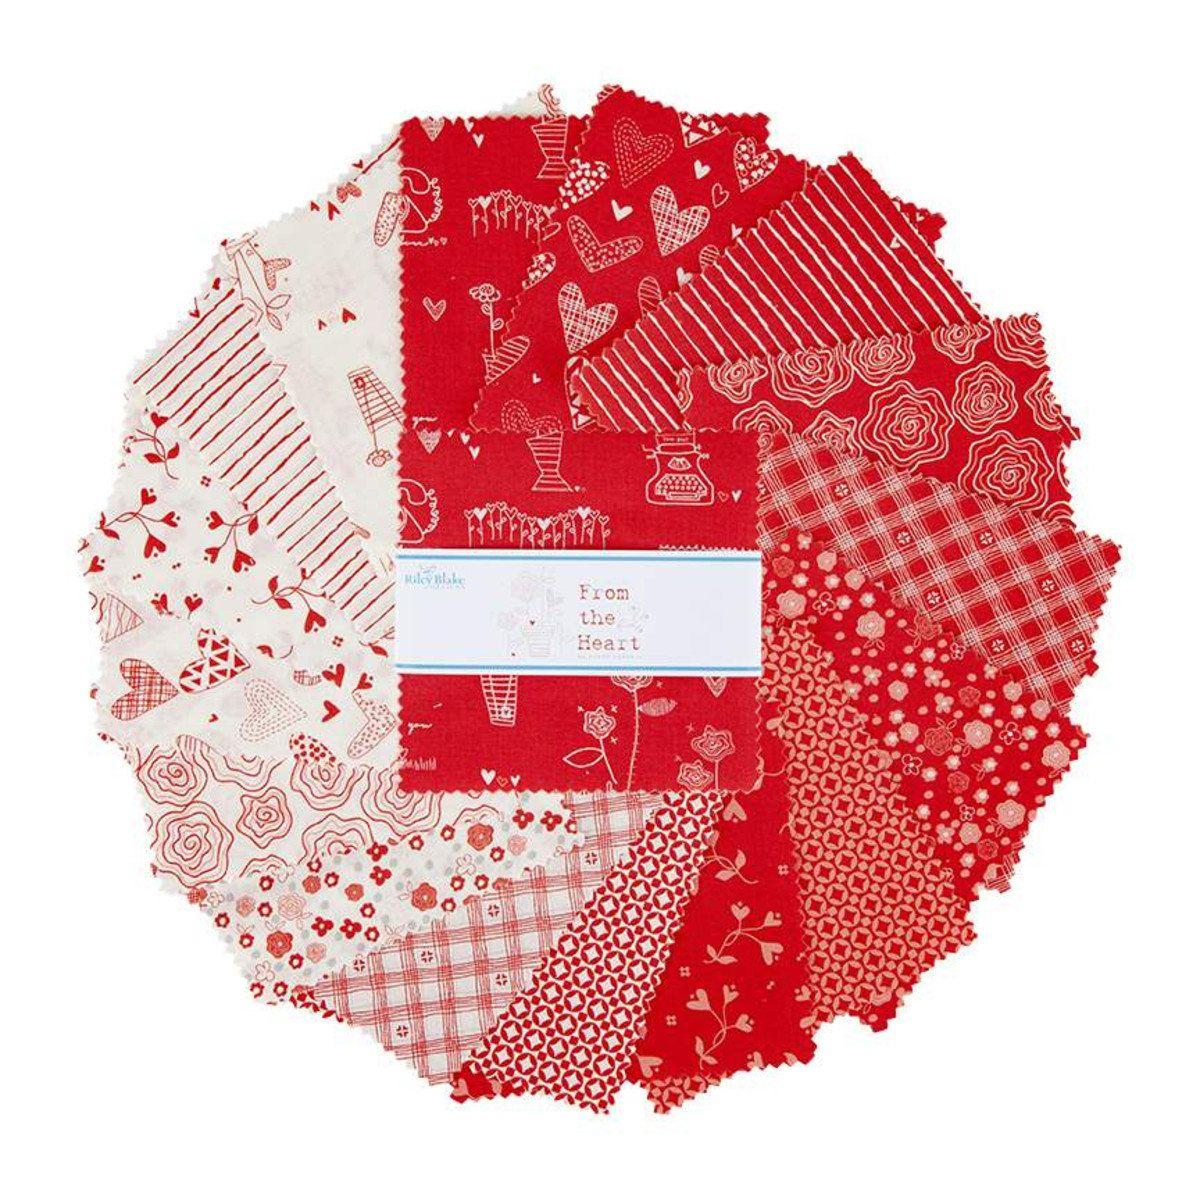 Thin Twigs Berries SALE Classic Caskata Twigs C10384 Red Quilting Cotton Fabric Riley Blake Designs